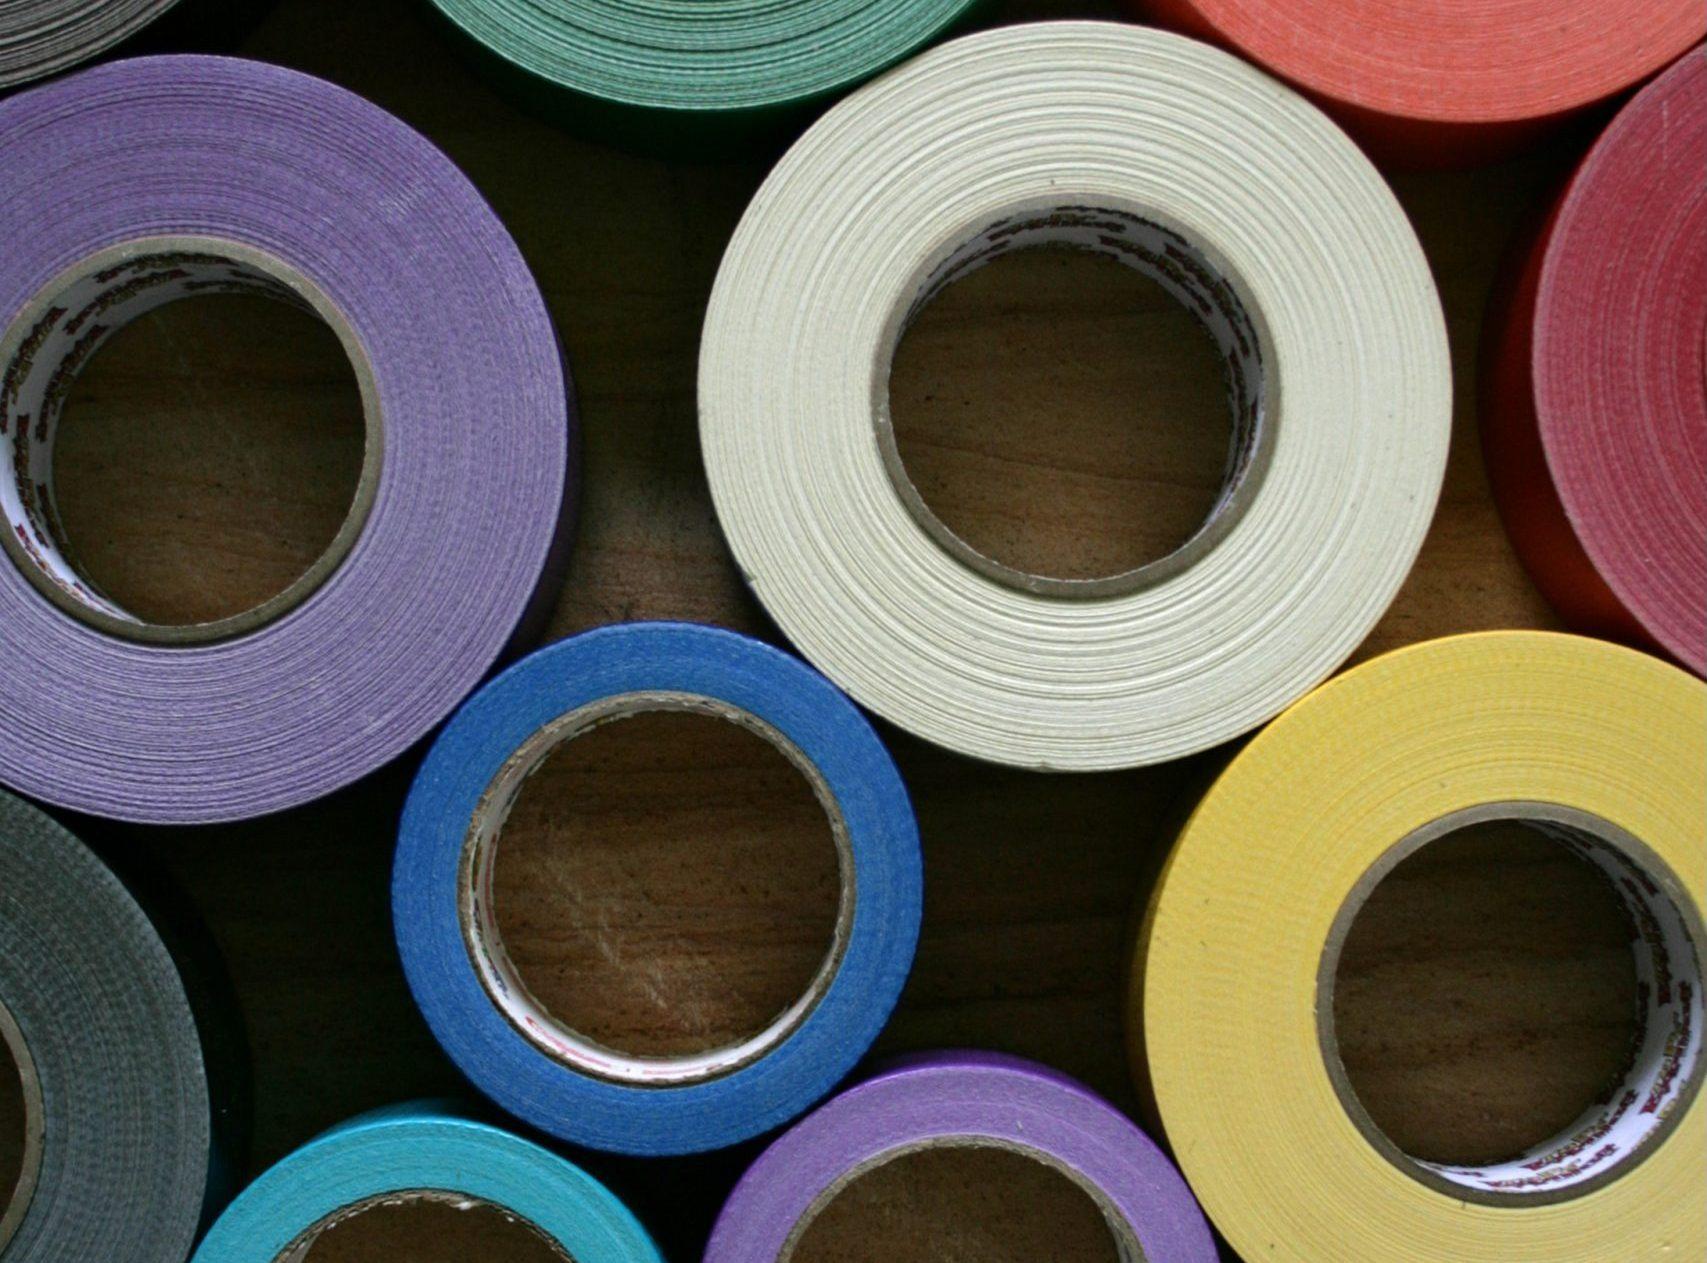 rollos de cinta aislante